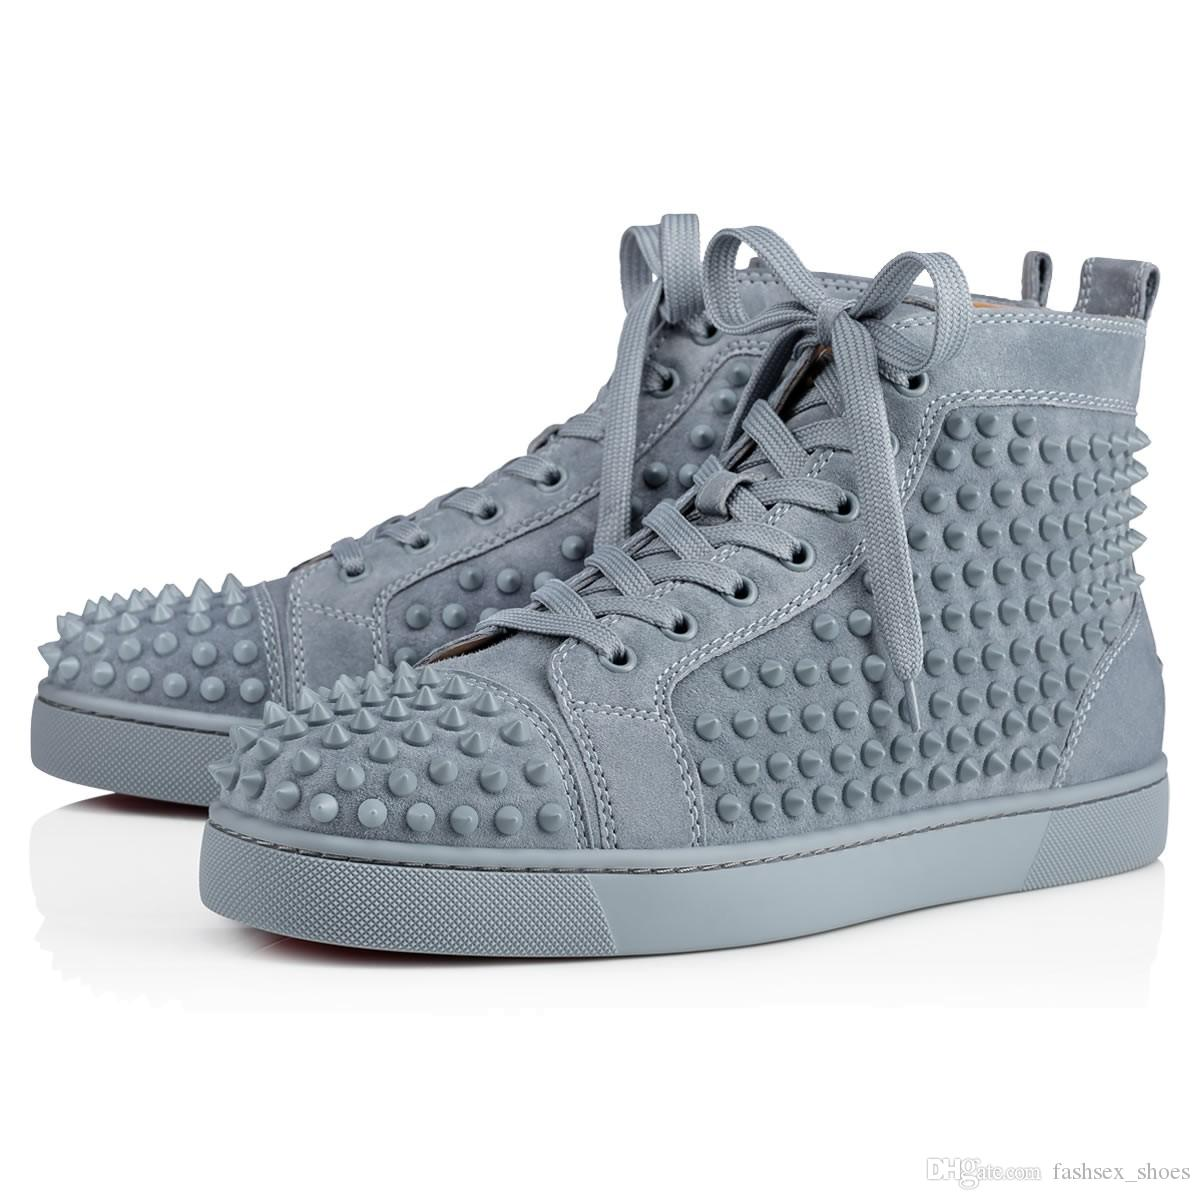 3ec8374de9ef 2019 Brand Fashion Men Designer Shoes Women Luxury Strass Spikes ...